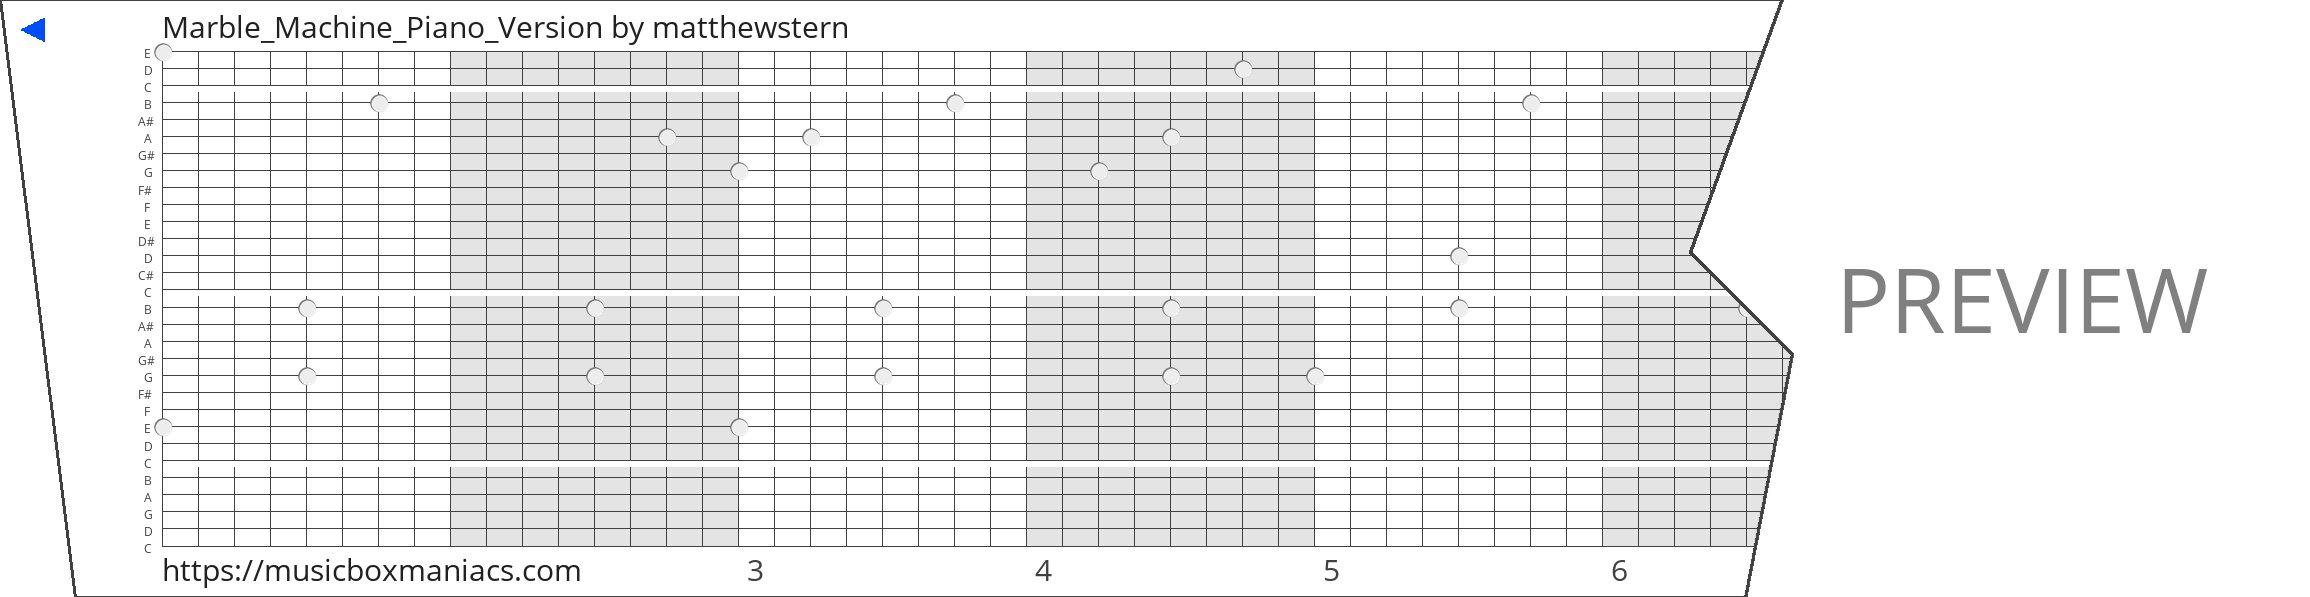 Marble_Machine_Piano_Version 30 note music box paper strip